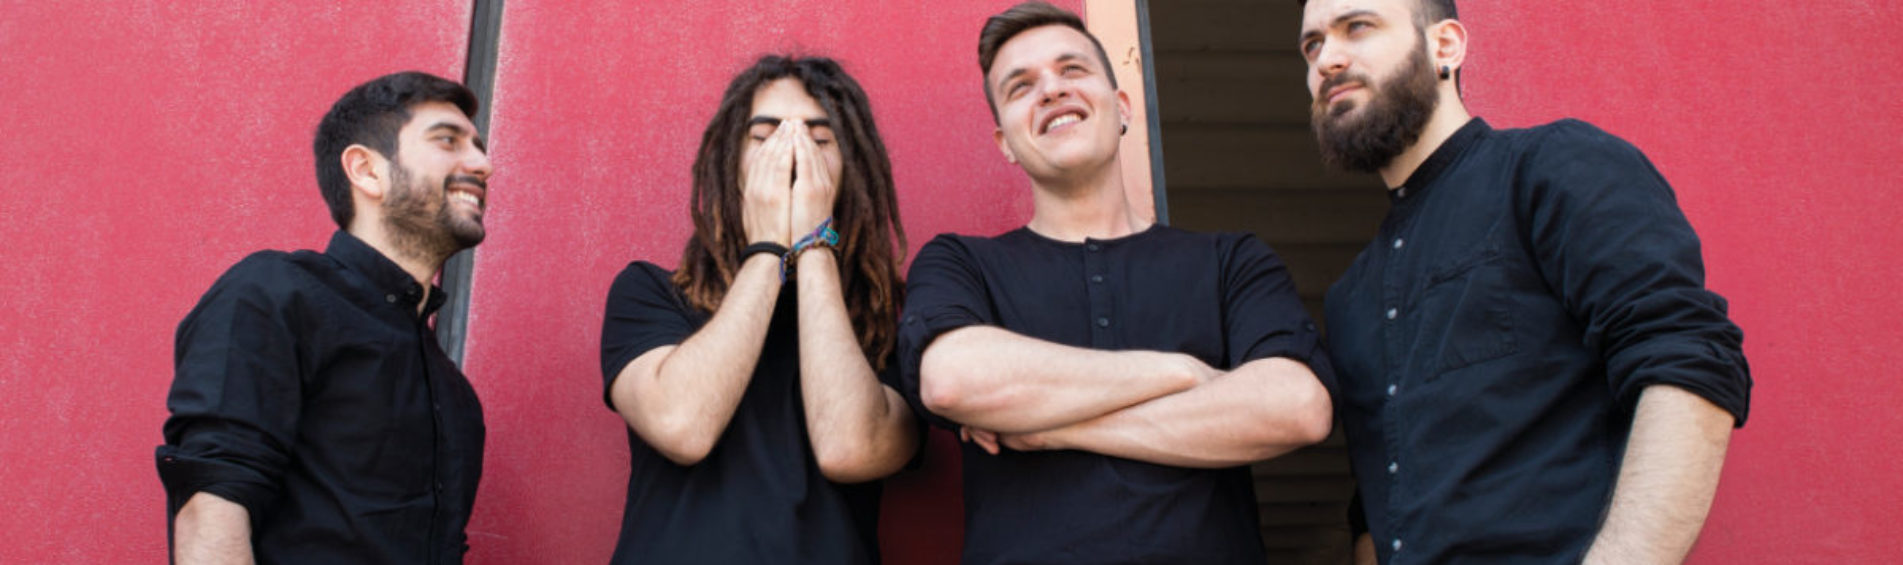 "Fabrica presentano il disco ""Bar Sayonara"""